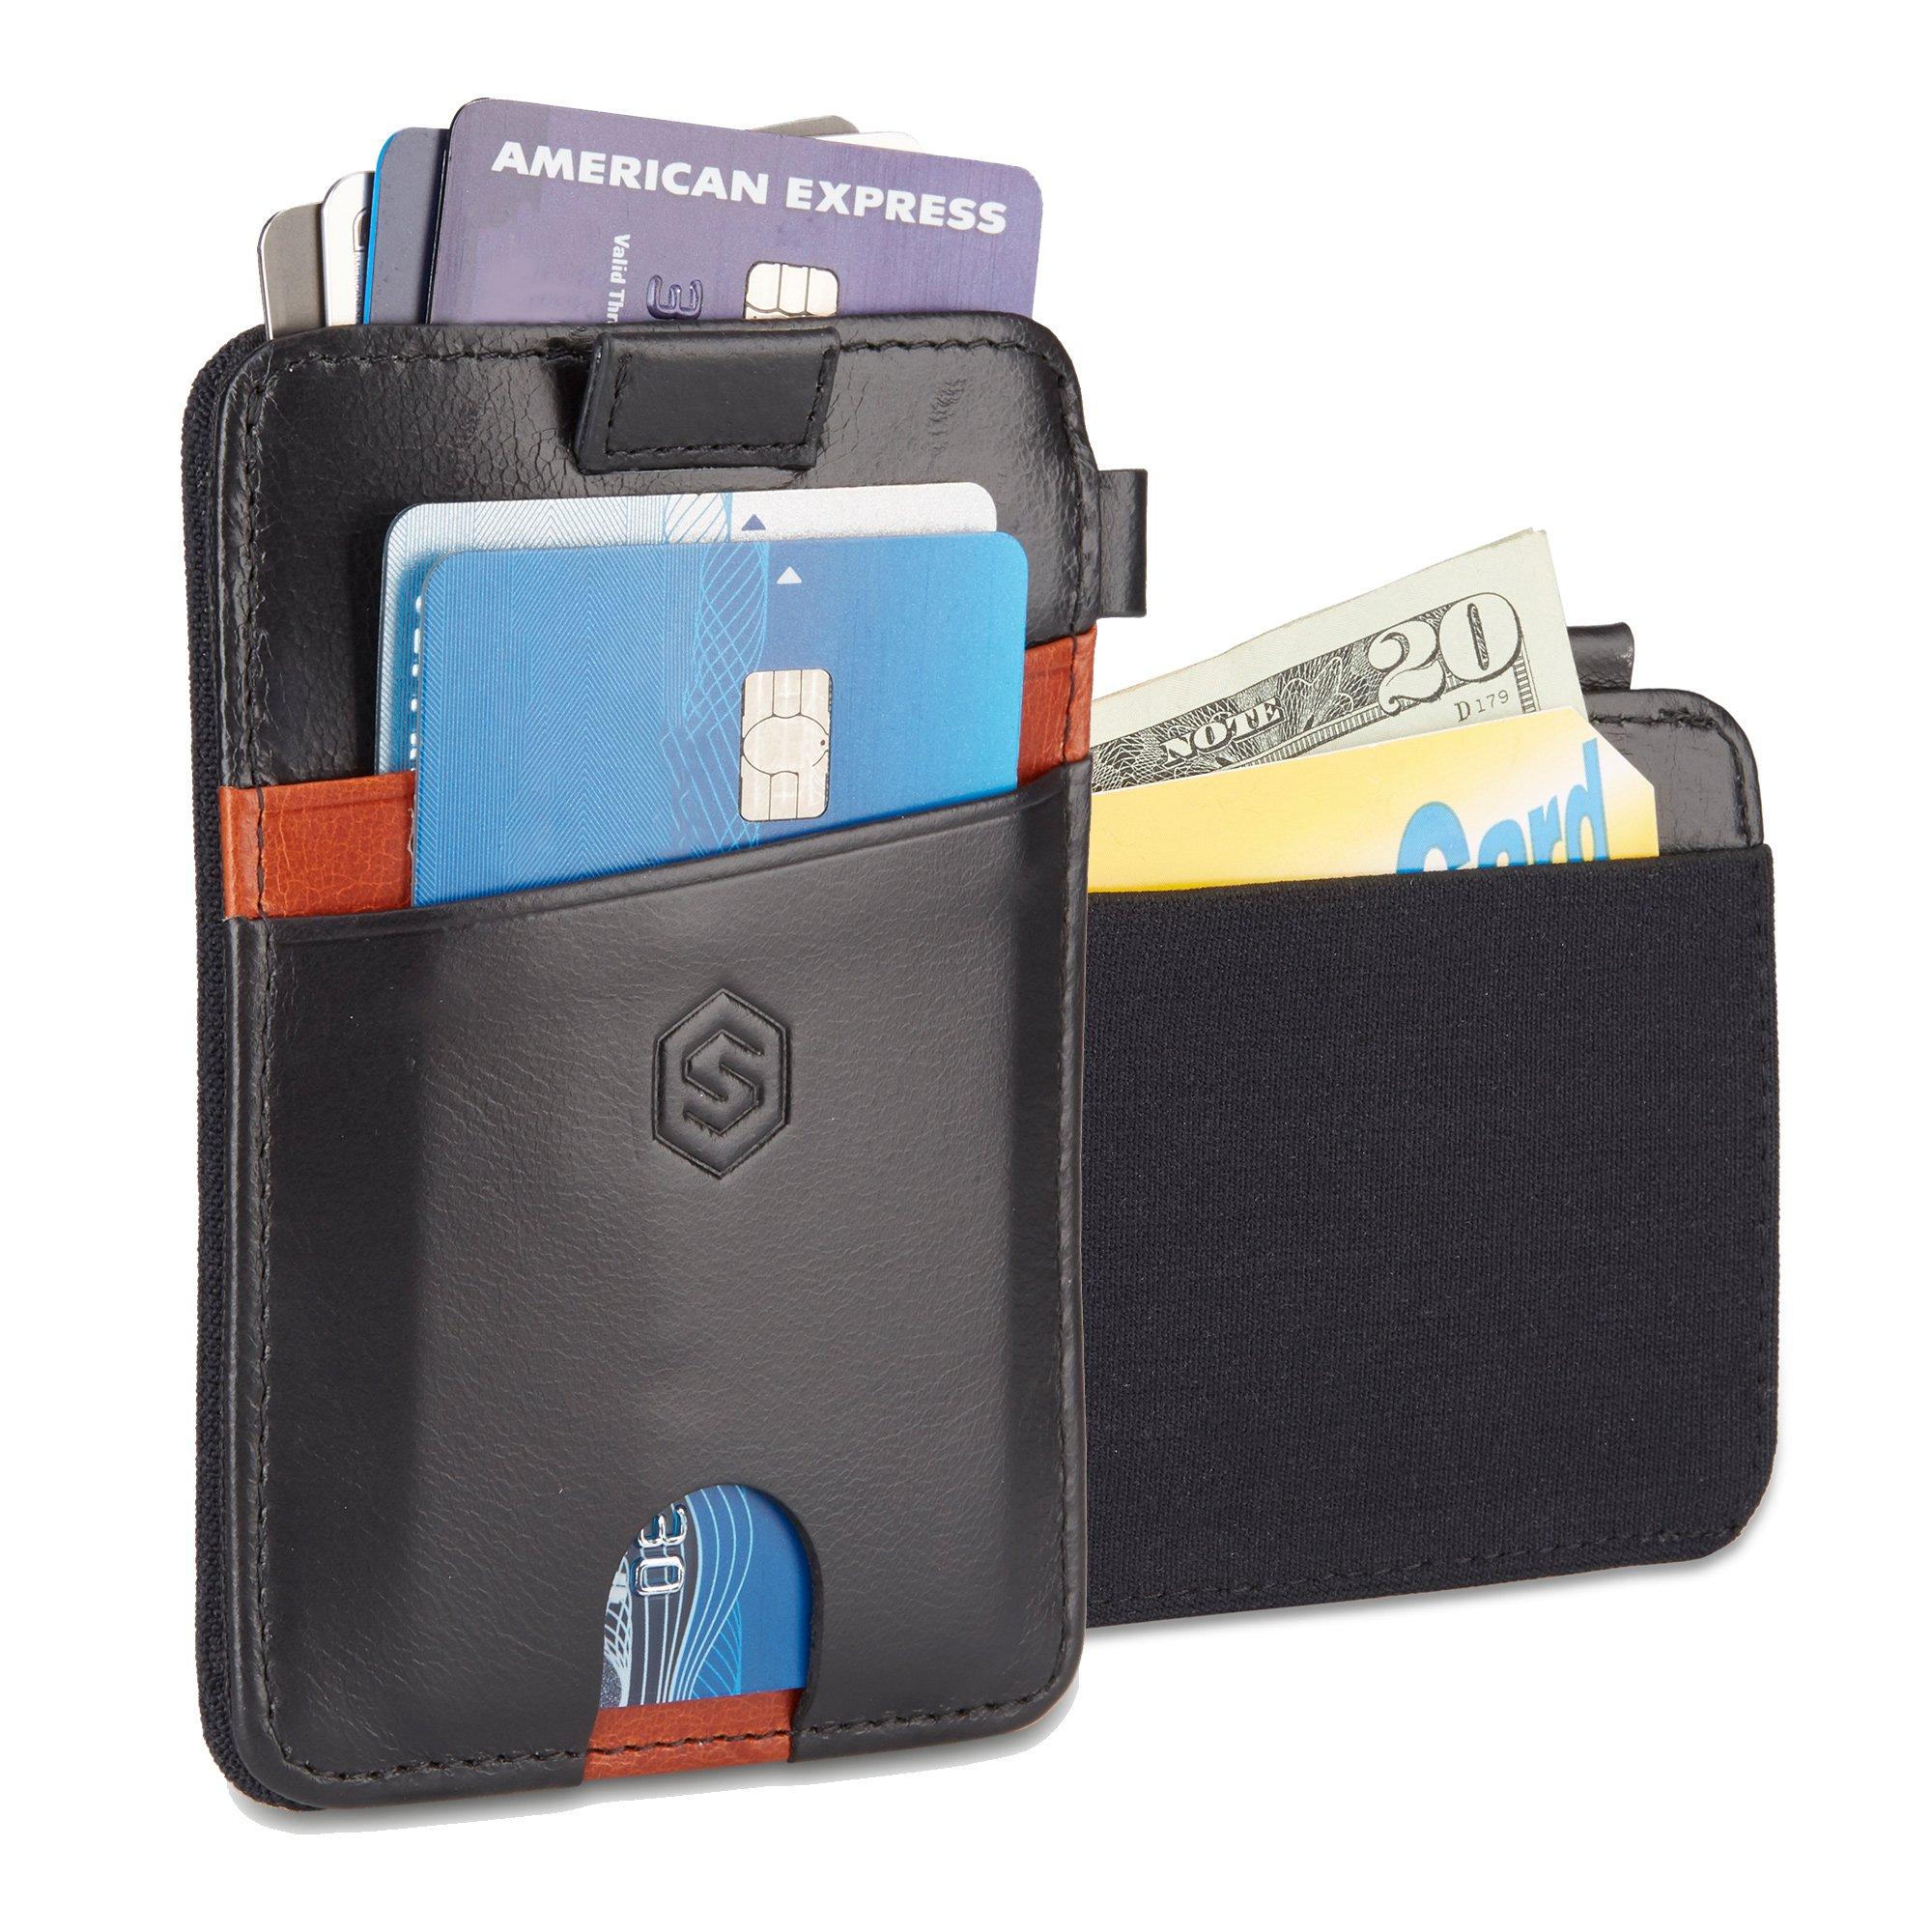 Strapo Wallet V2 (Black with brown)